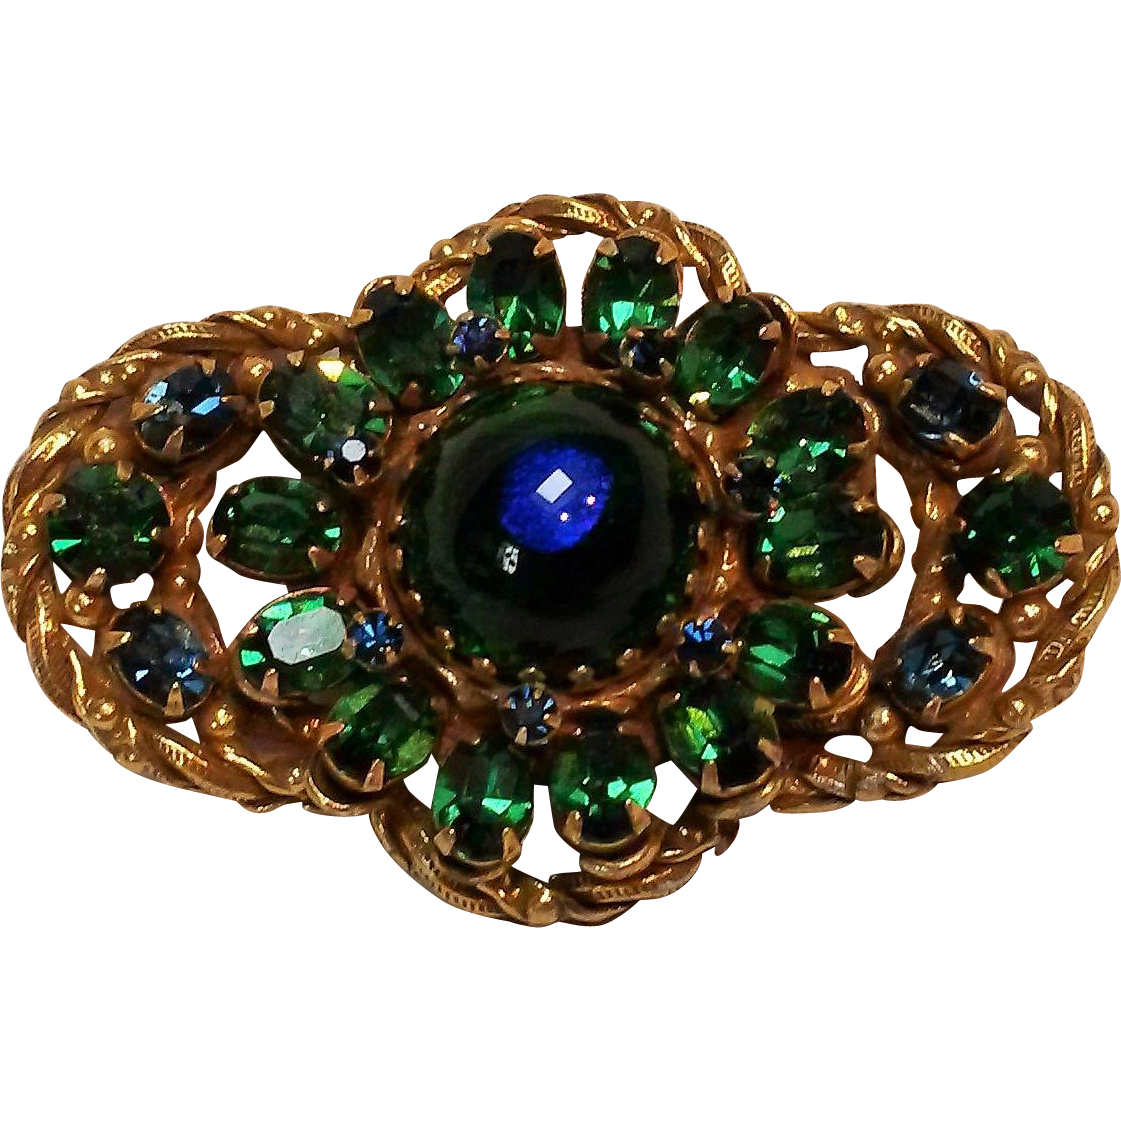 Peacock glass and rhinestone brooch pin blue green